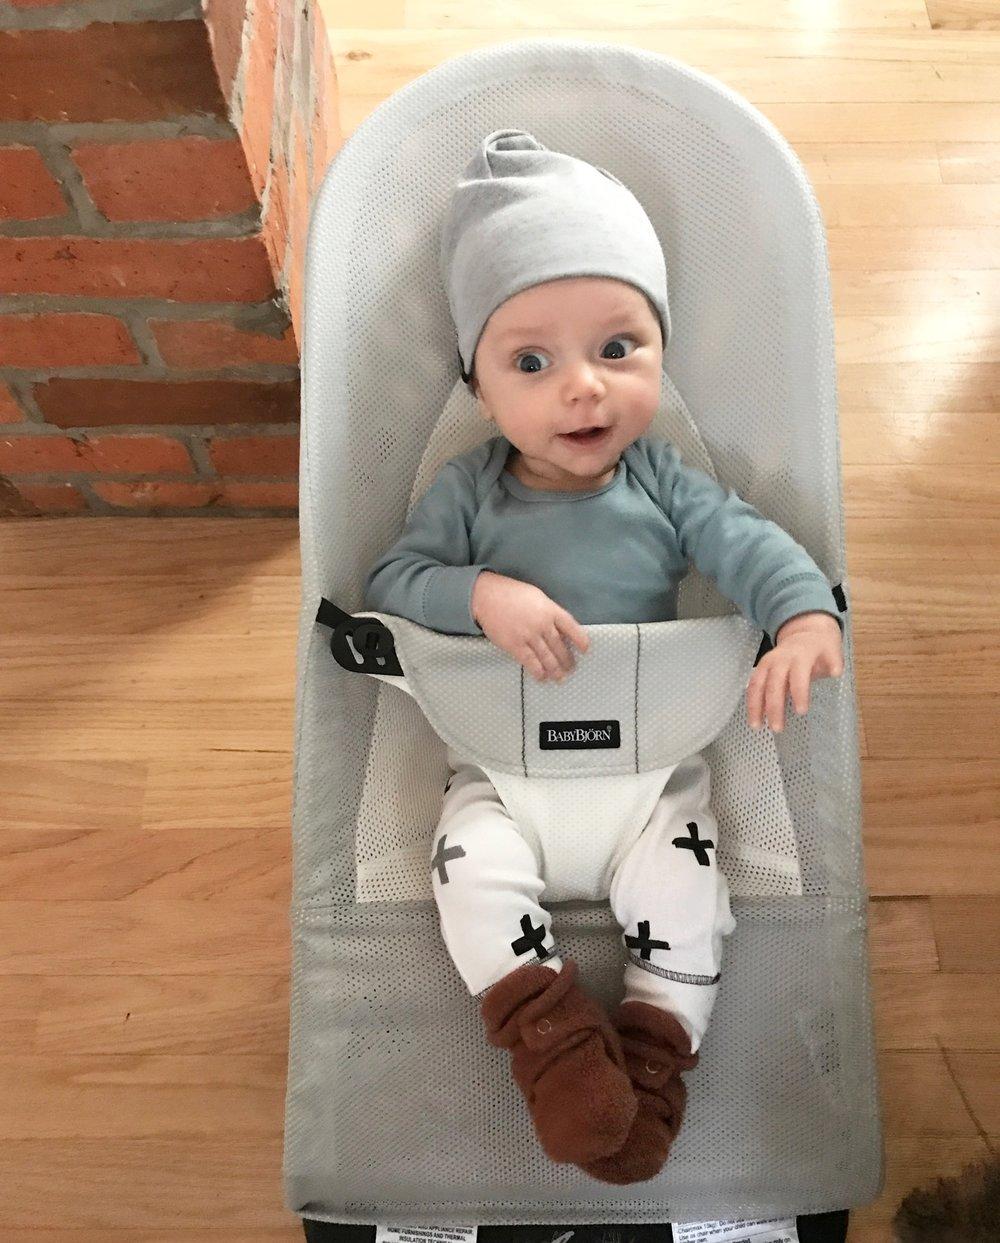 Rhys, 3 months old